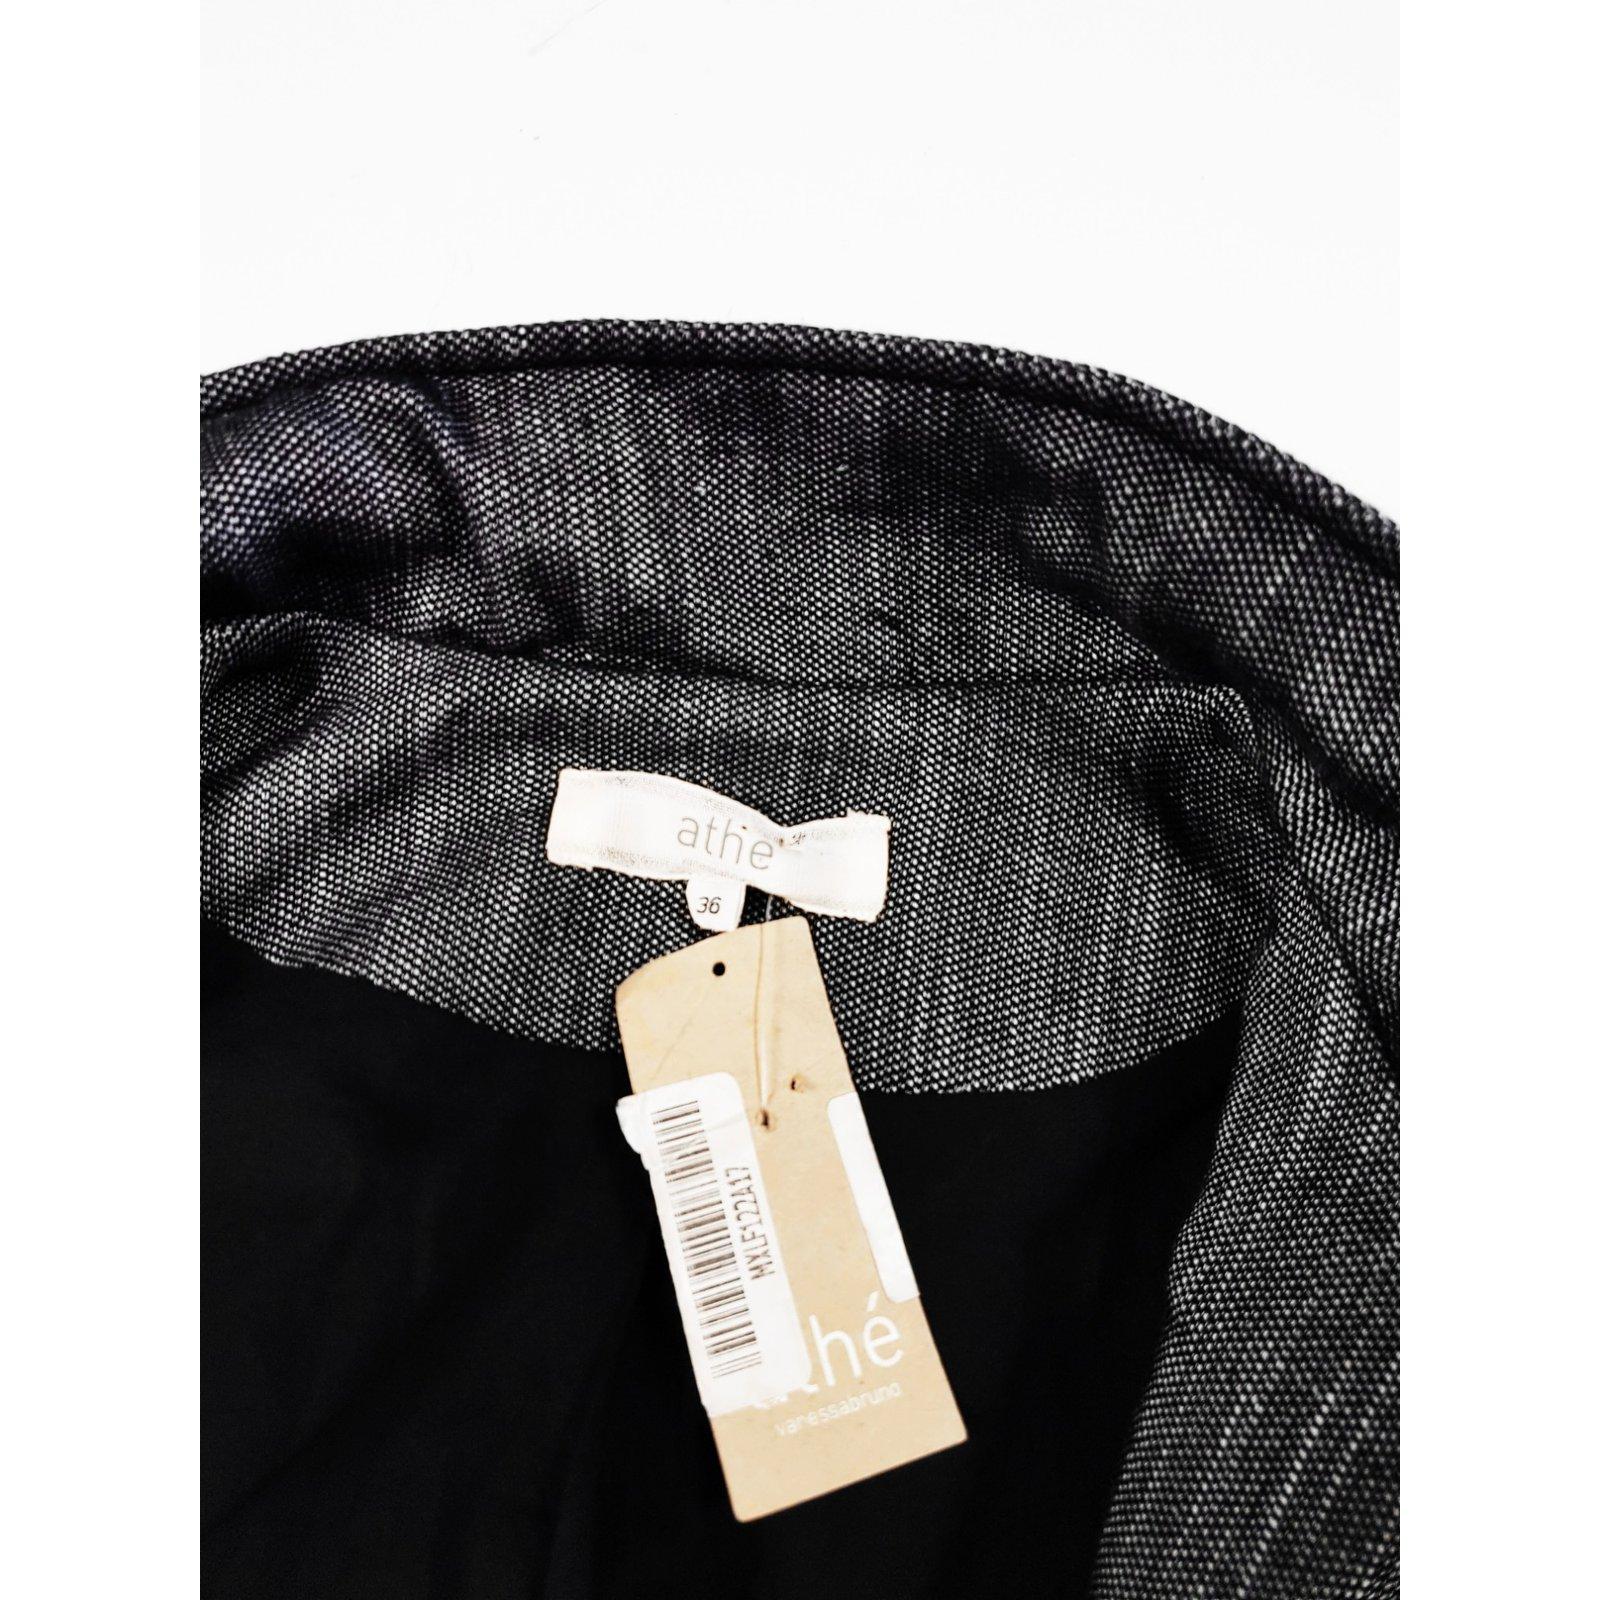 88927 Electronicswiring Diagram Komatsu Fg30ht 12 Wiring Vanessa Bruno Athe Coats Outerwear Cotton Dark Grey Ref